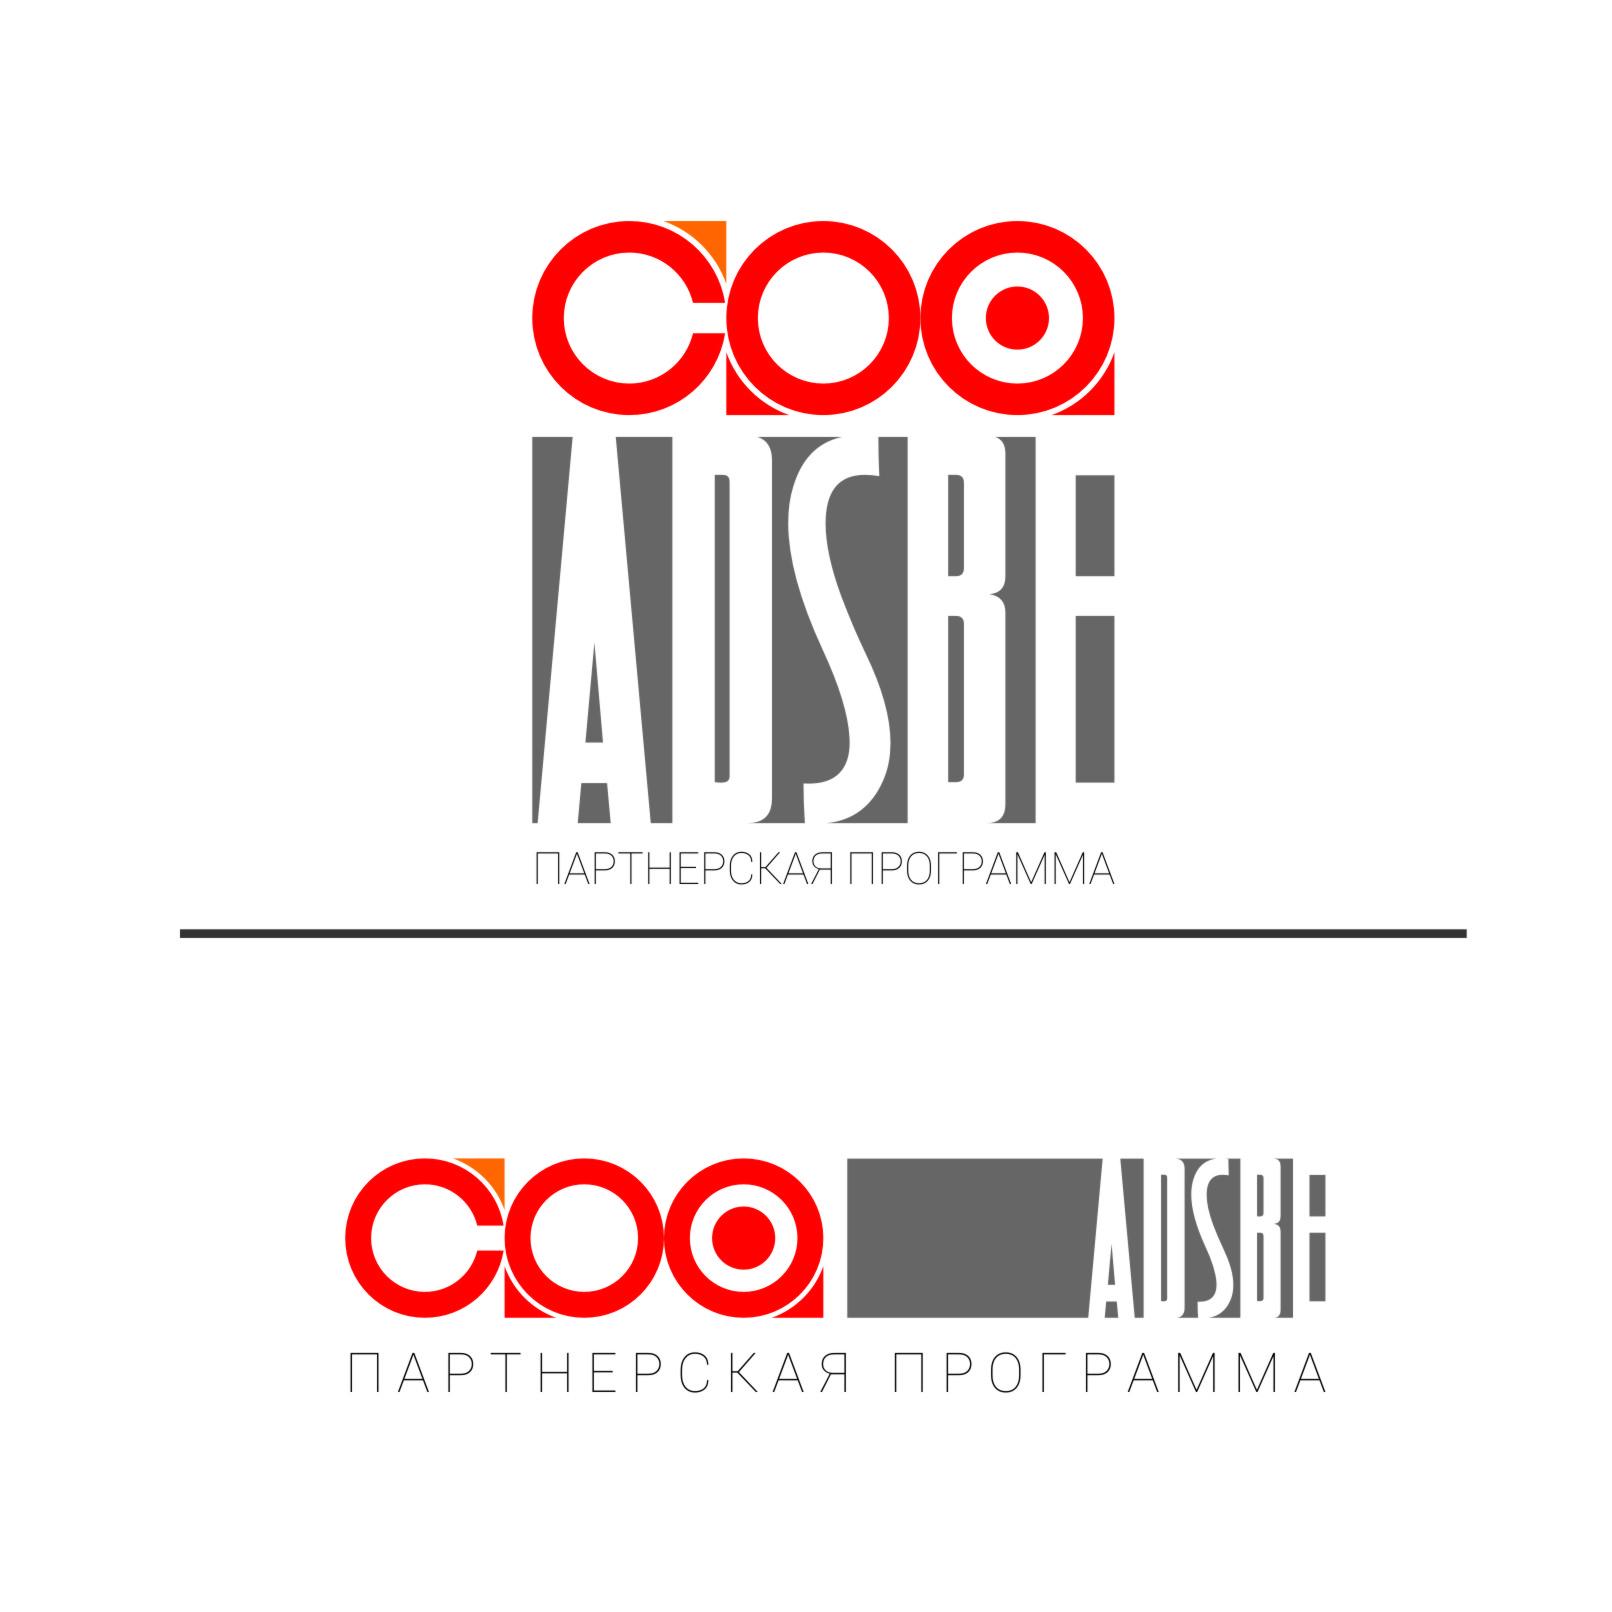 Разработка логотипа для CPA-сети фото f_295586230c468aff.jpg